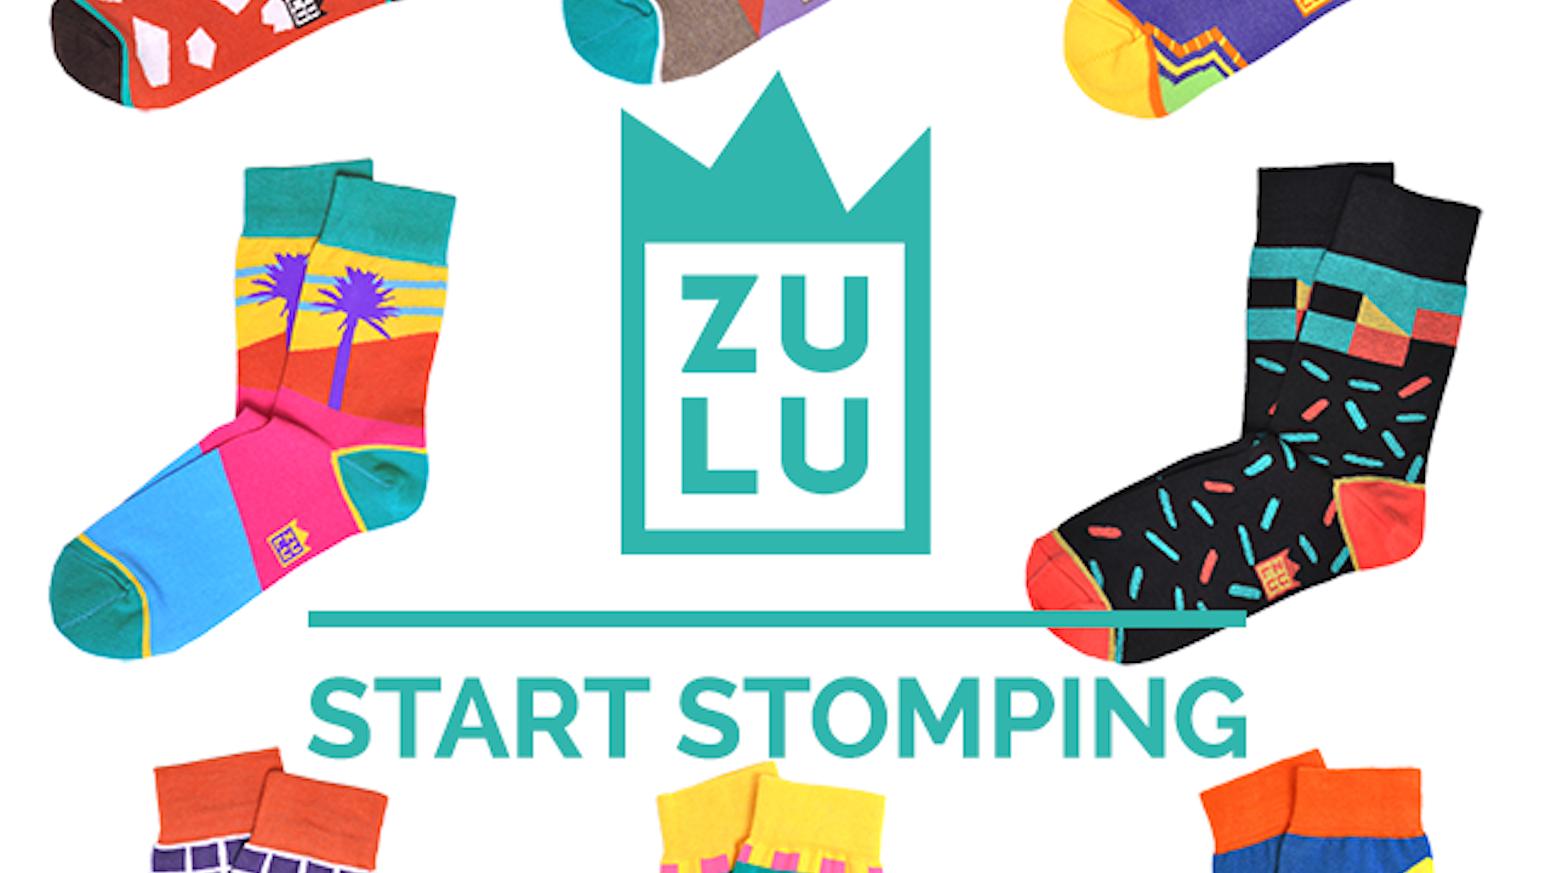 Zulu-Store Dating-Show